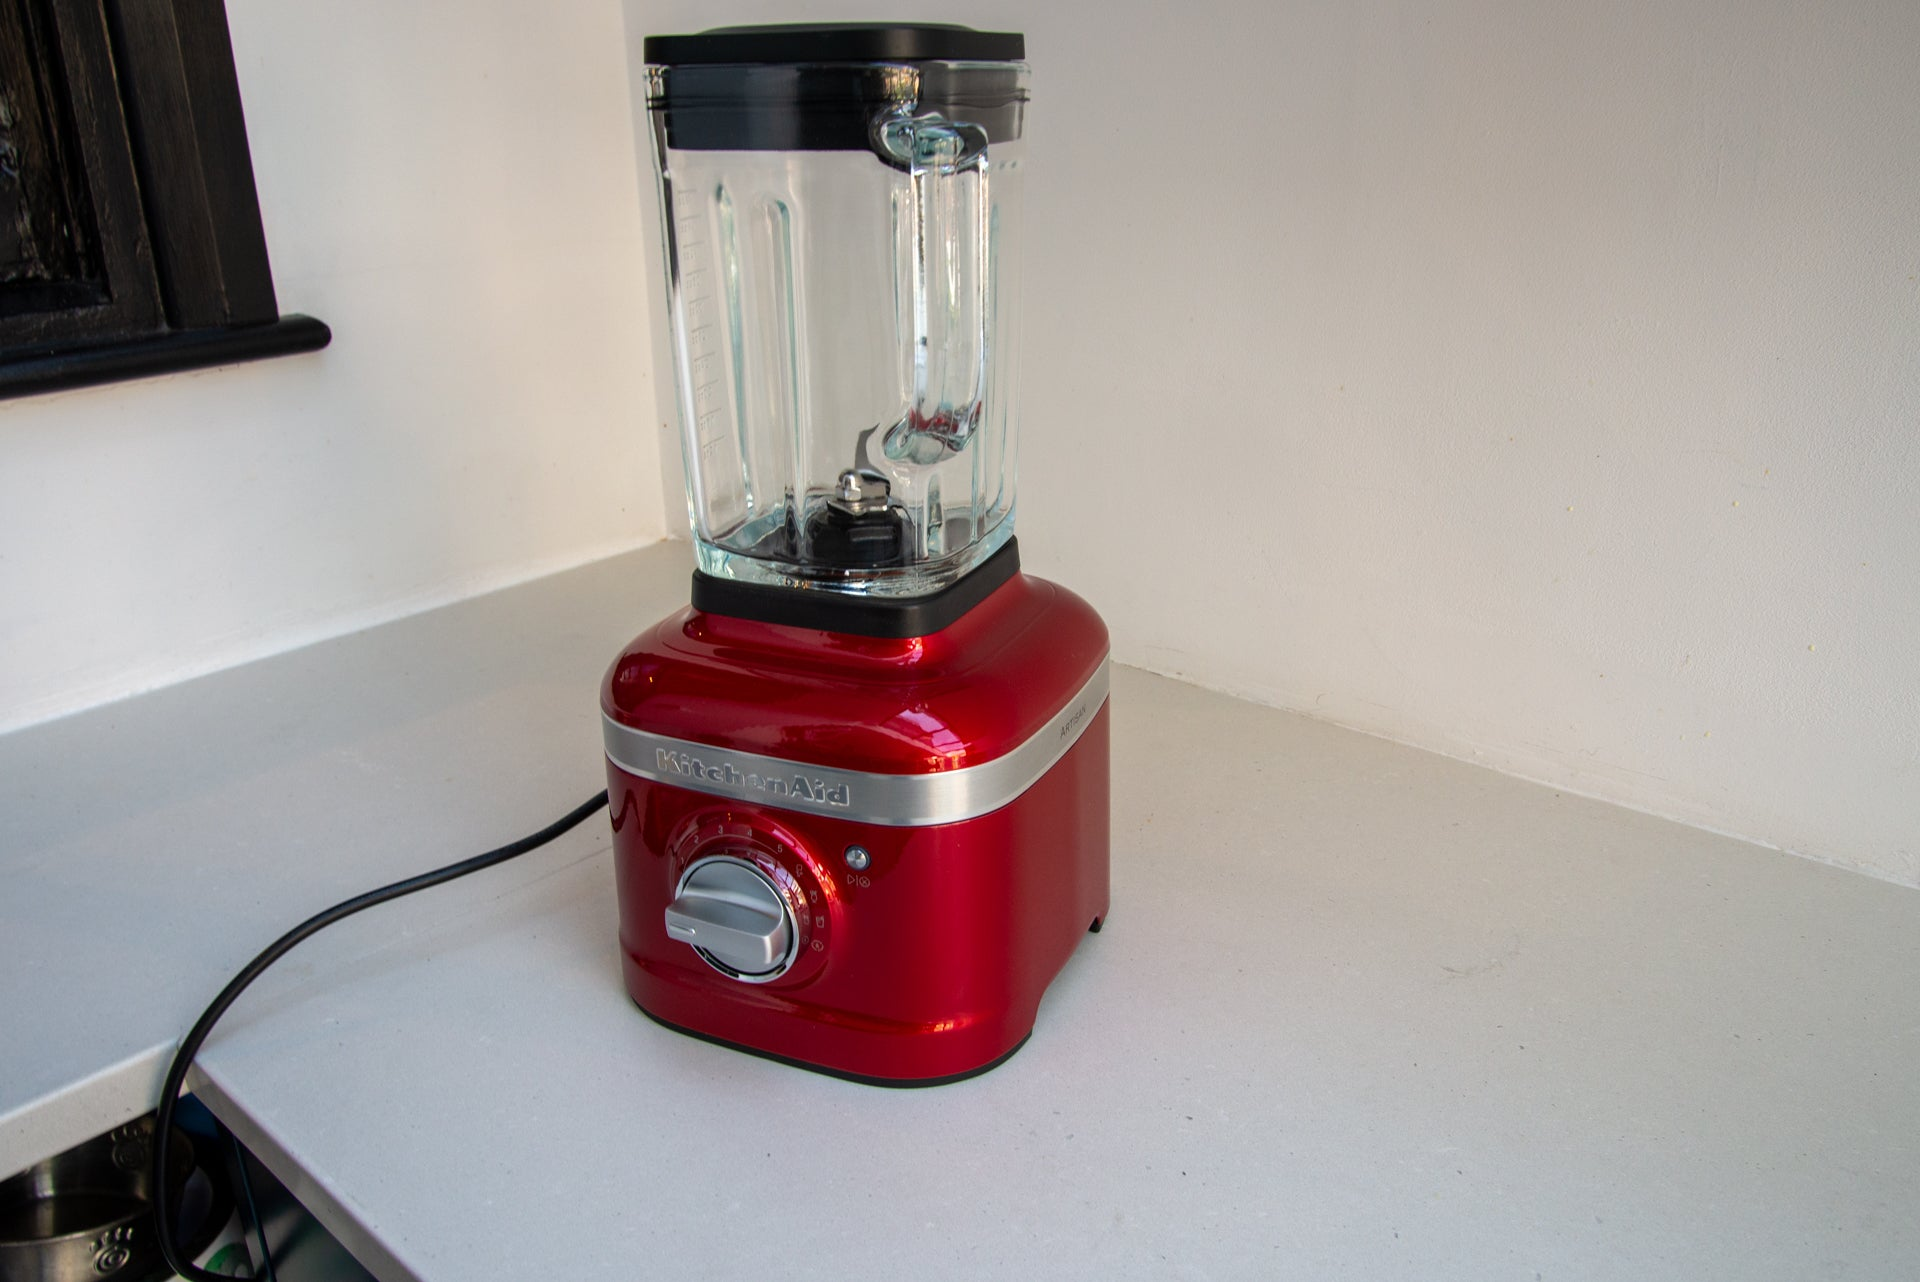 Kitchenaid Artisan Blender K400 Review